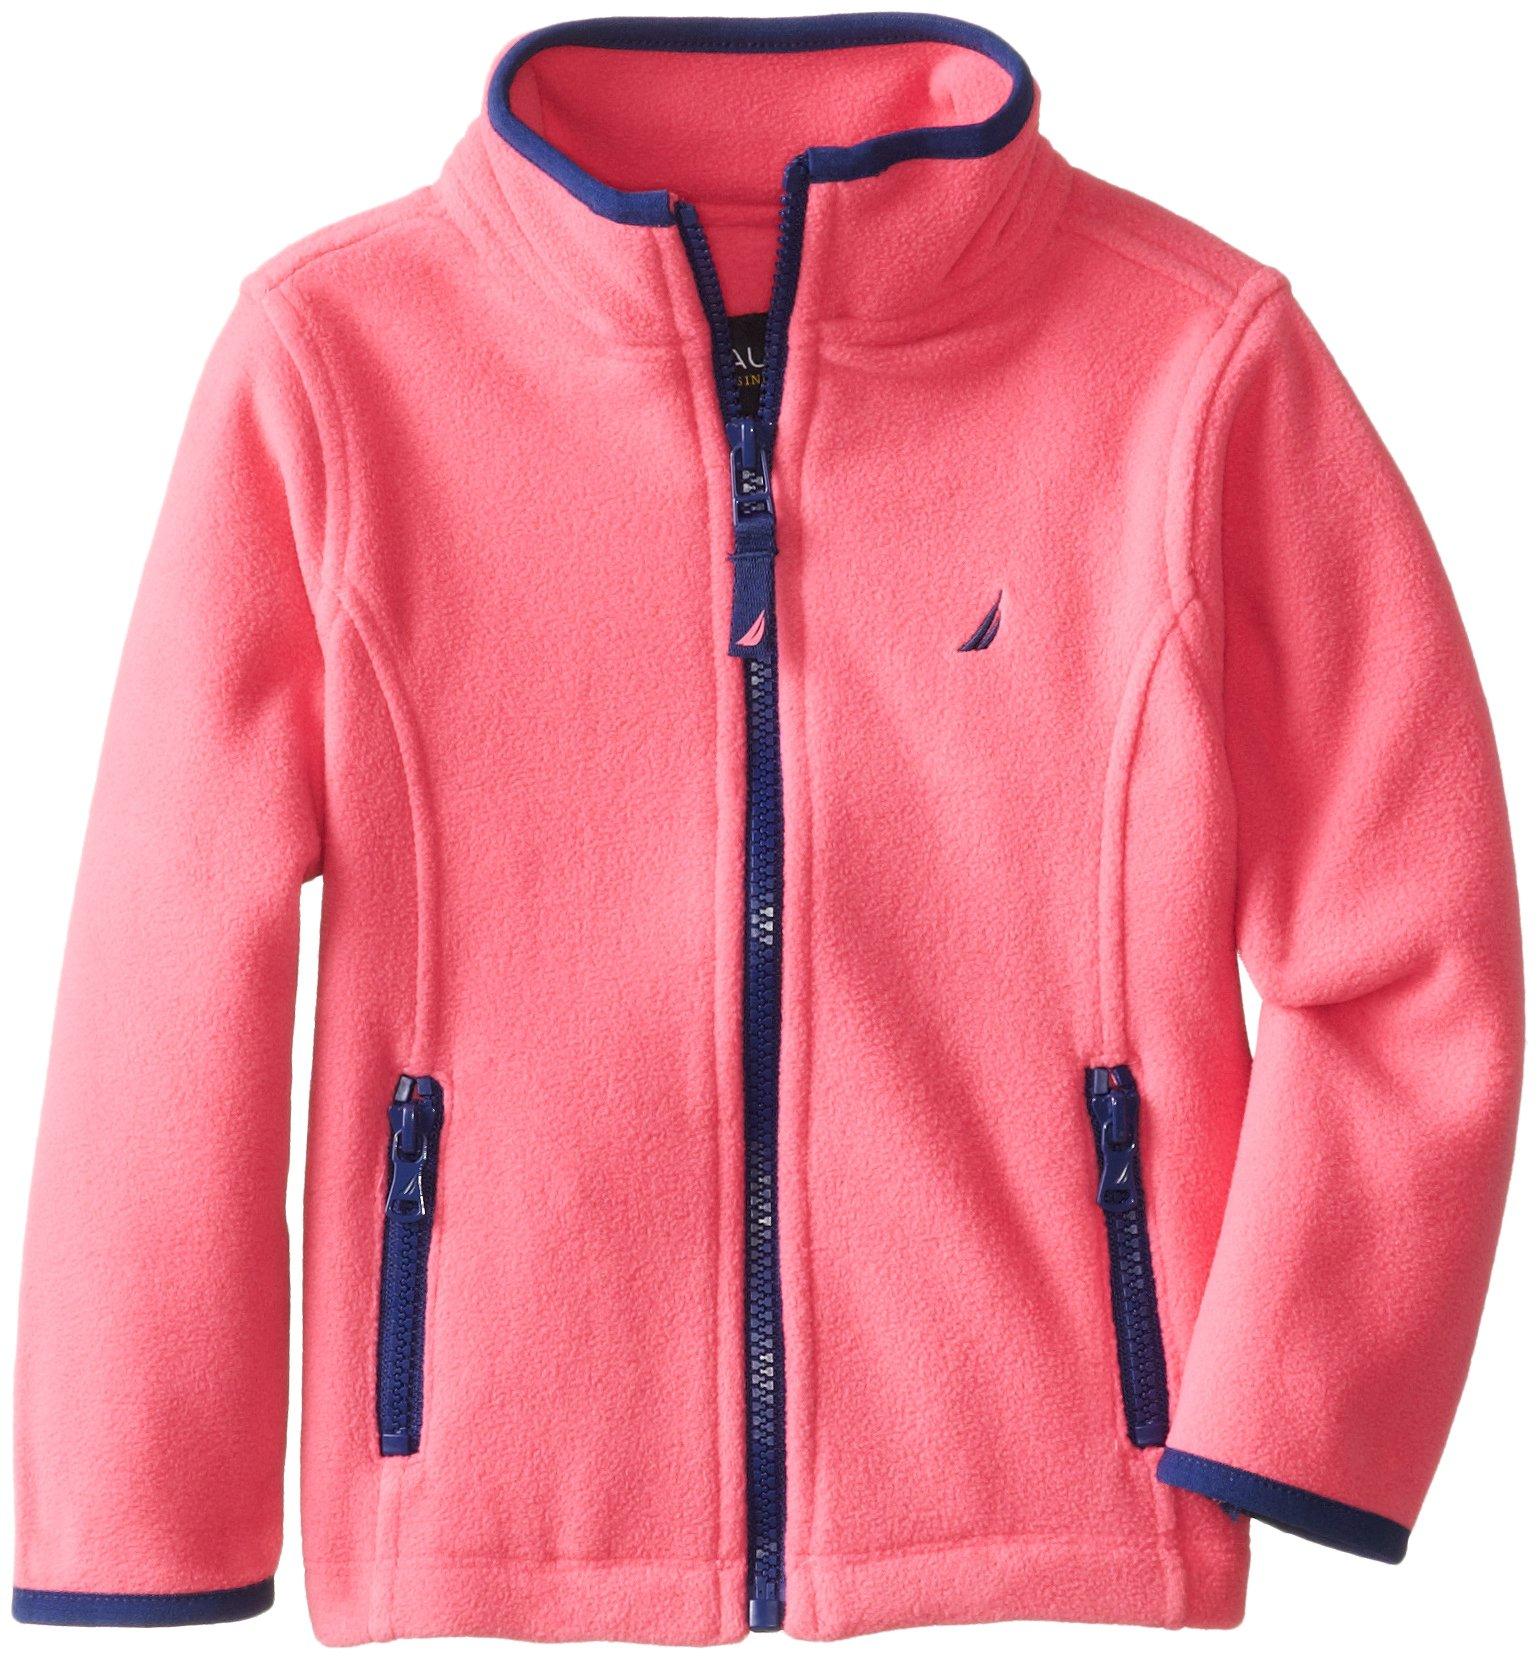 Nautica Little Girls' Toddler Polar Fleece Front Zip Jacket, Pink, 4T